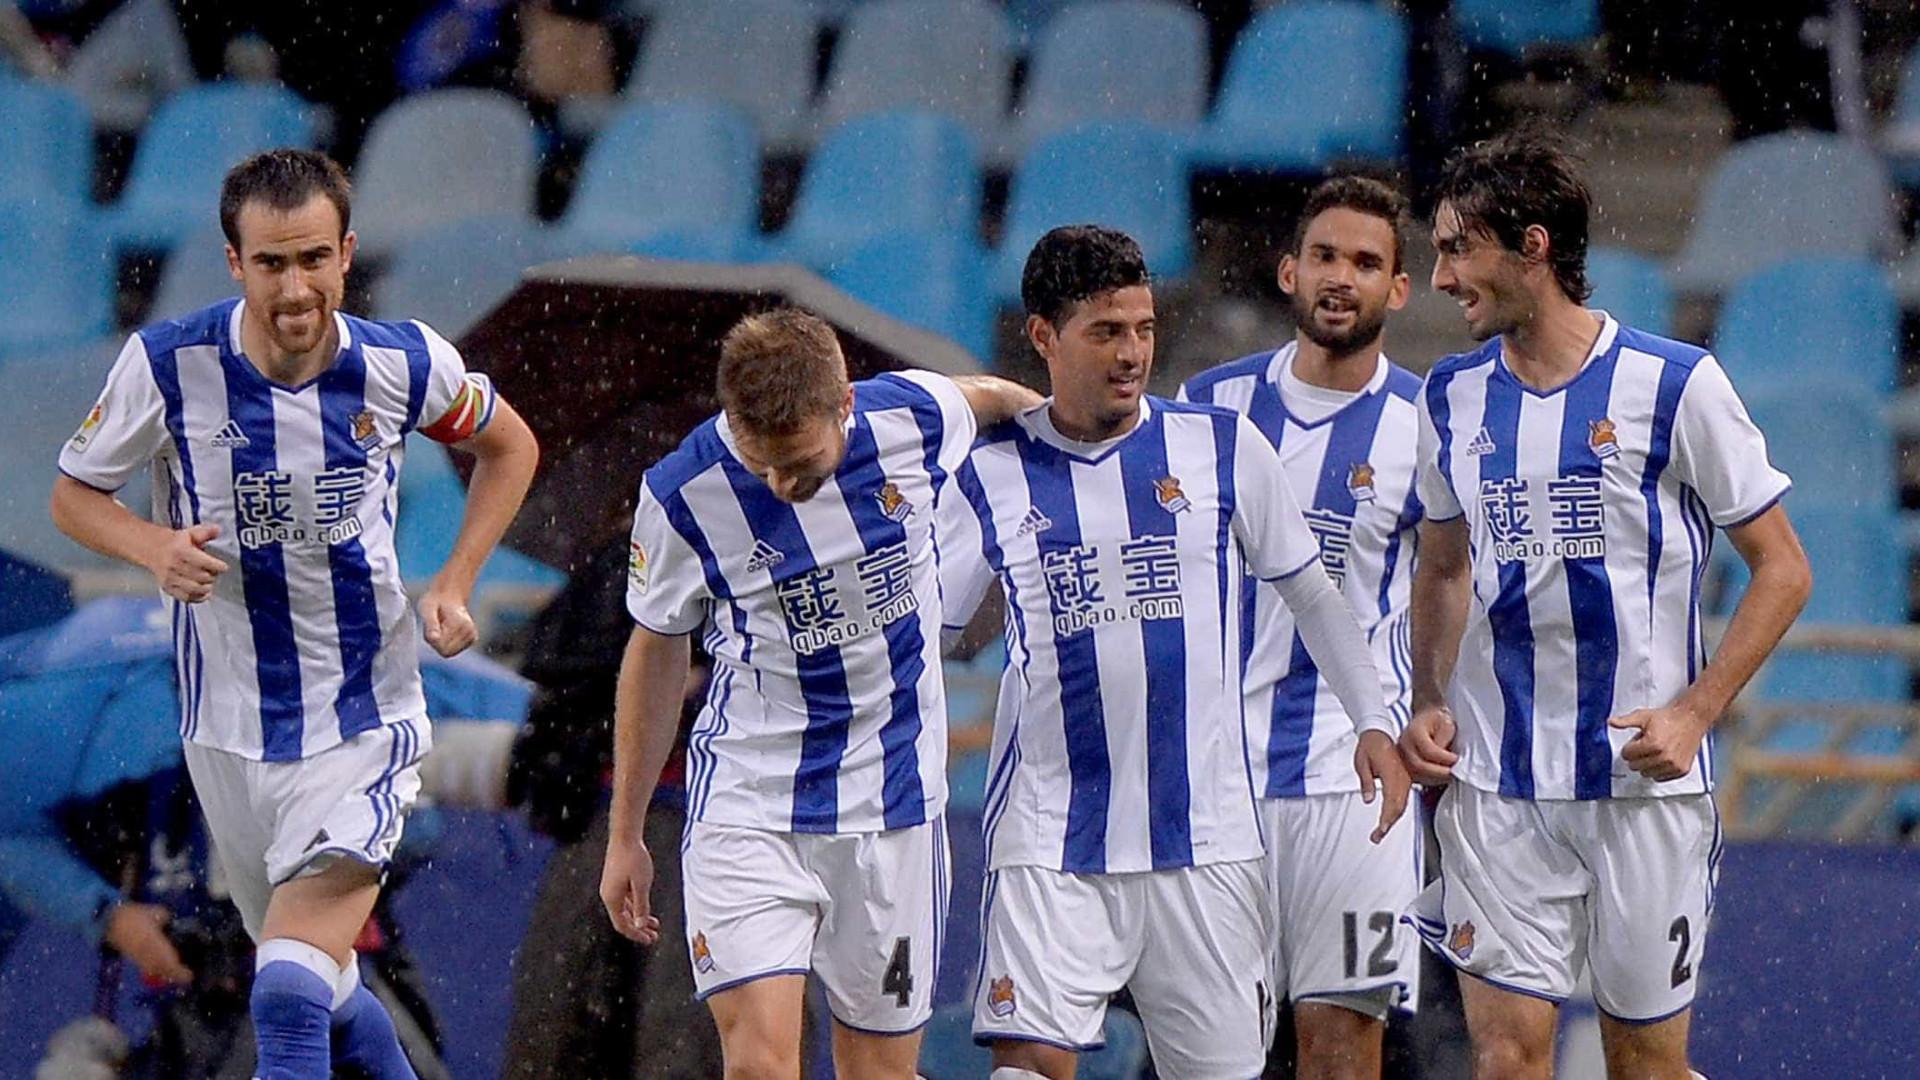 Espanhol: Real Sociedad vence La Coruña e segue na cola do Barcelona